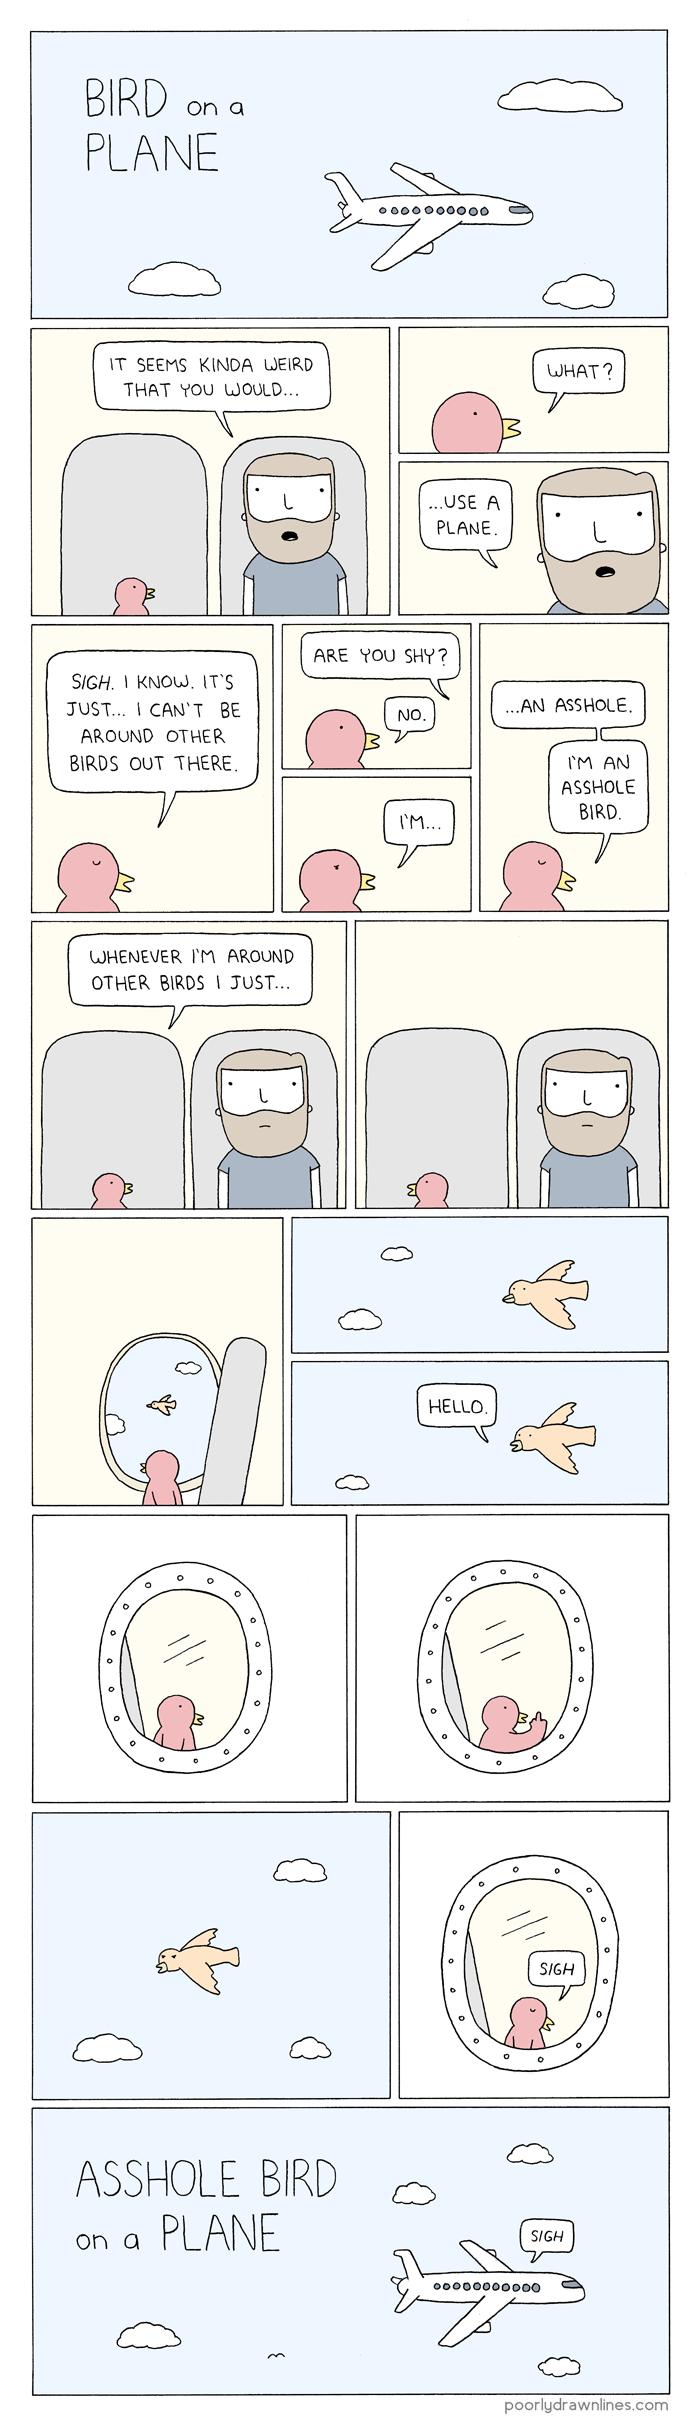 bird-on-plane